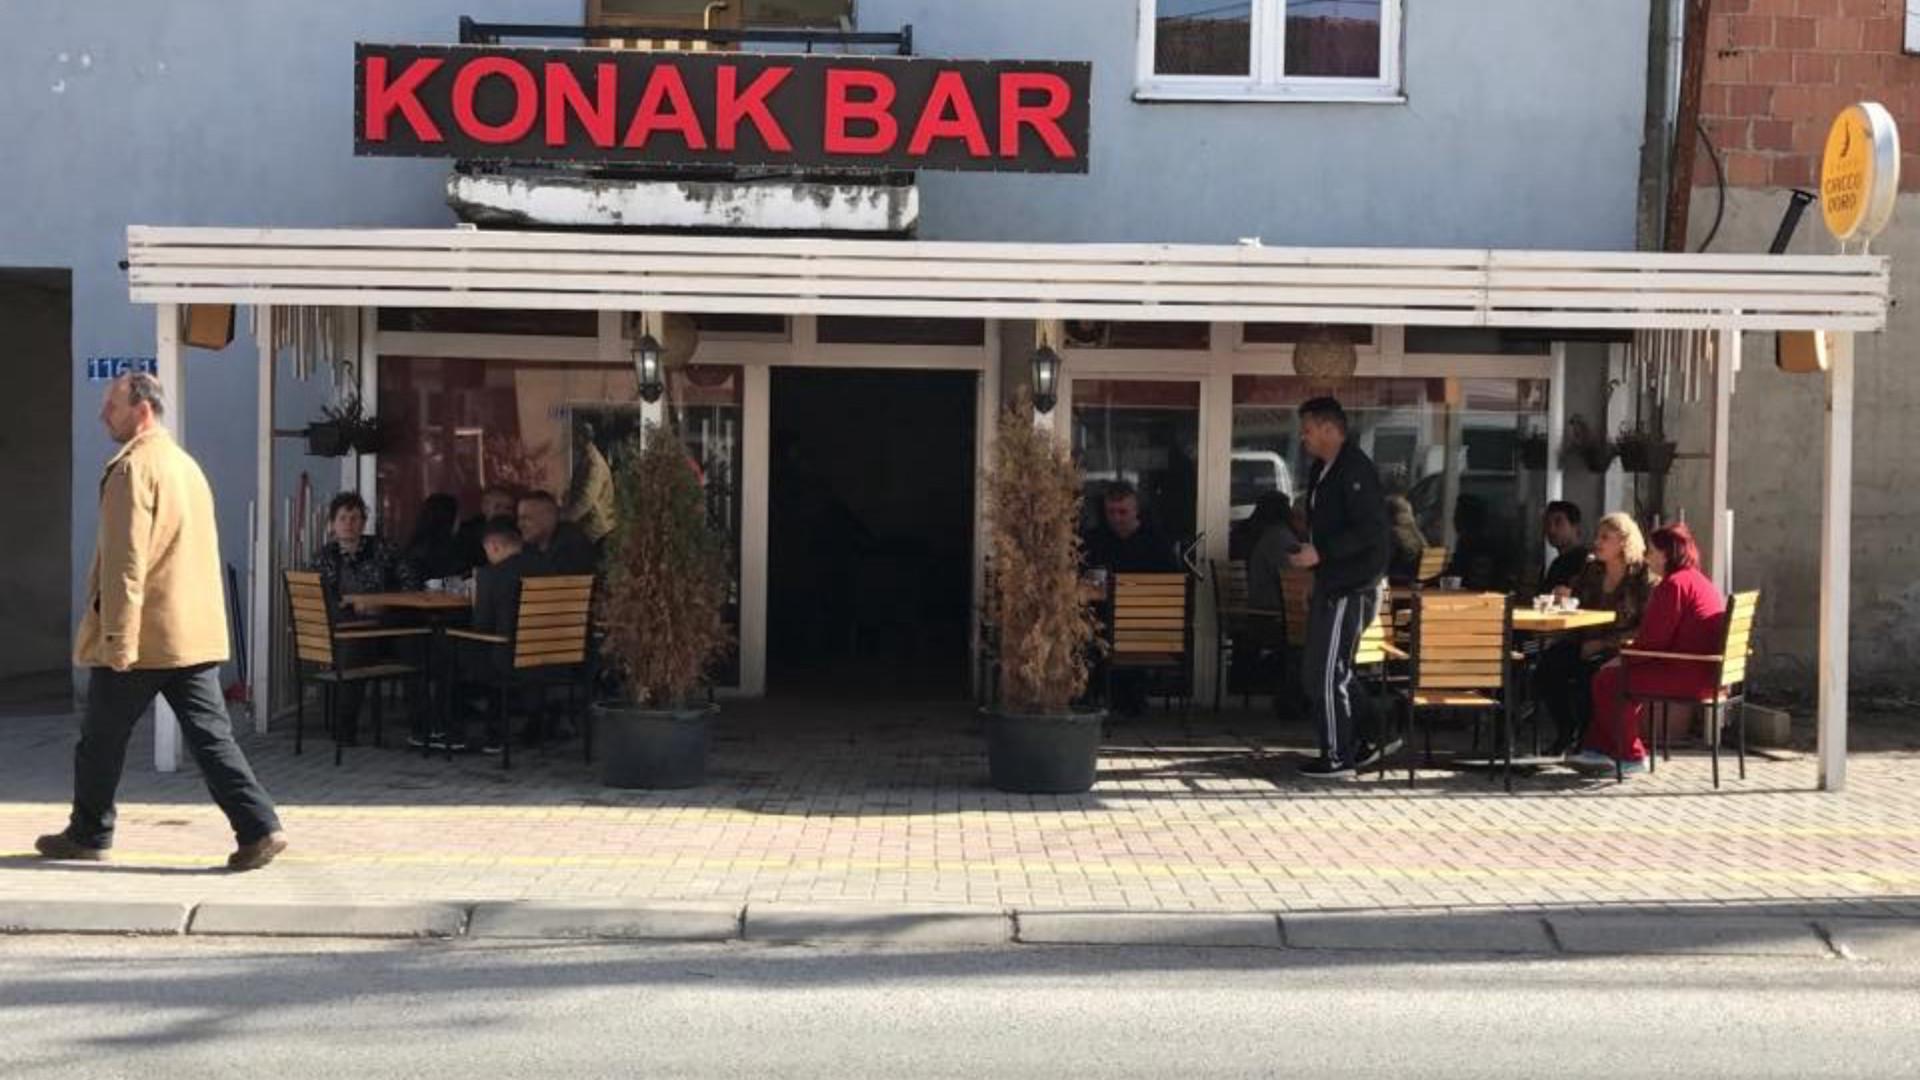 Konak Bar,Shtime